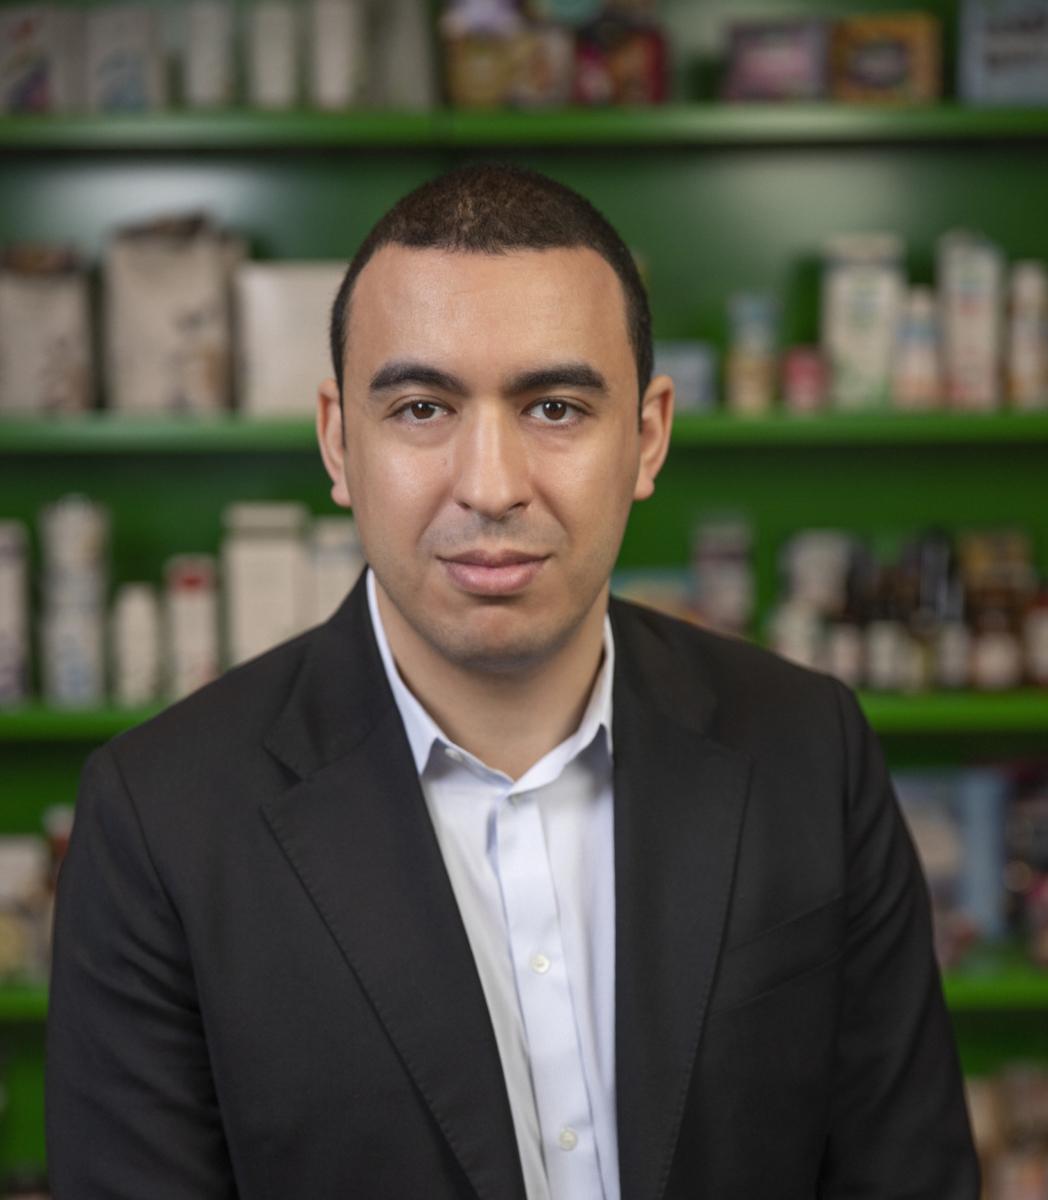 Tarik Belqaid, pressekreterare